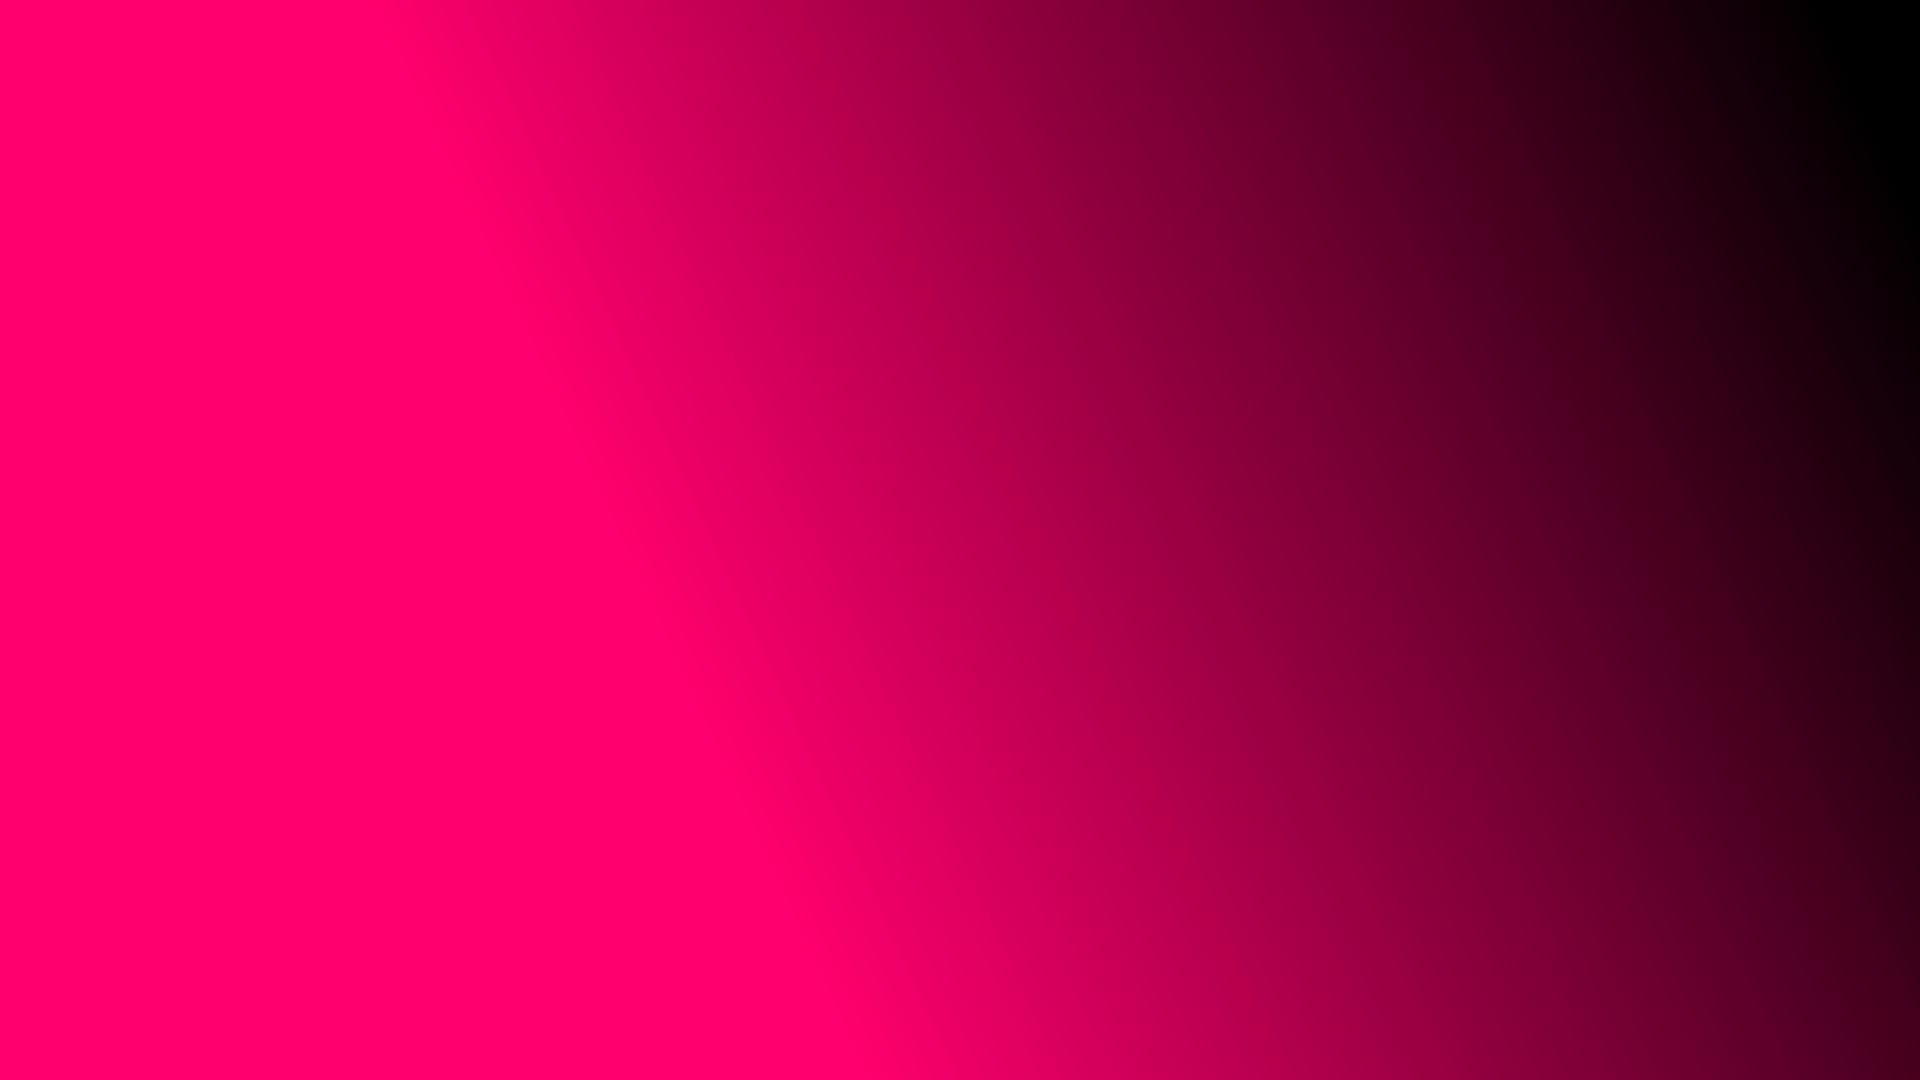 pink black gradient desktop backgorund 1920x1080